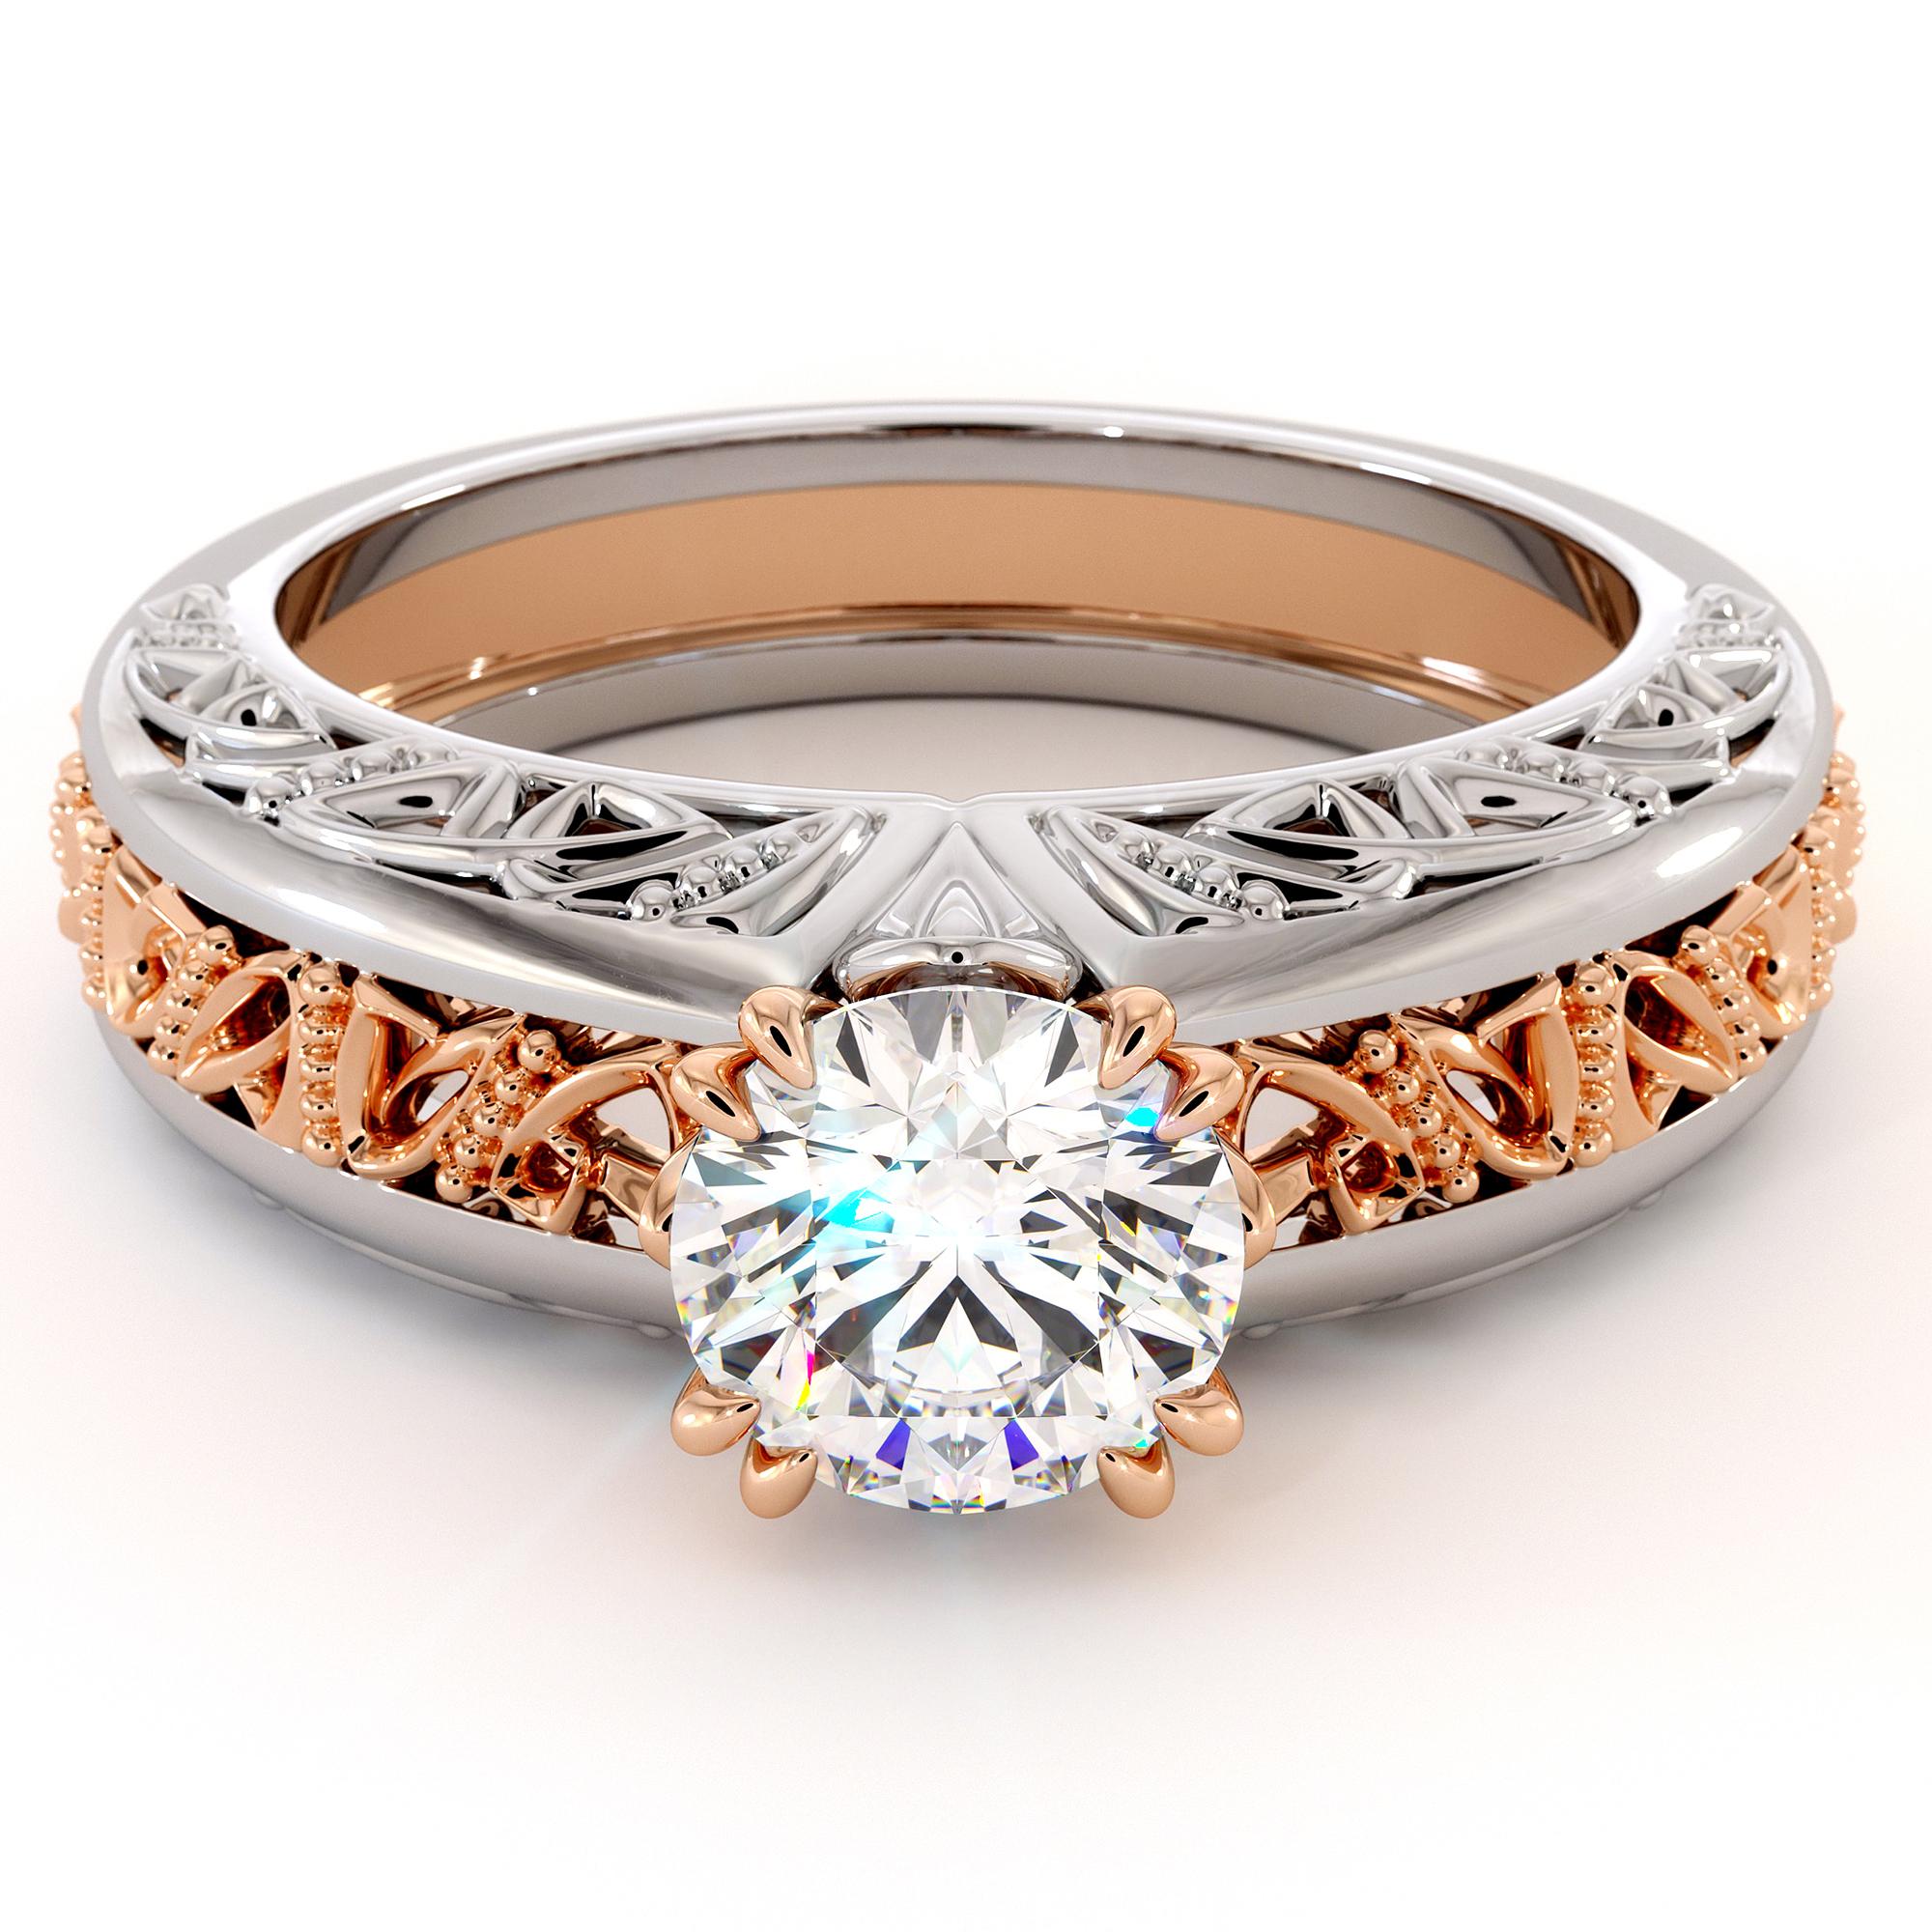 Handmade Majestic Round Moissanite Gold Ring